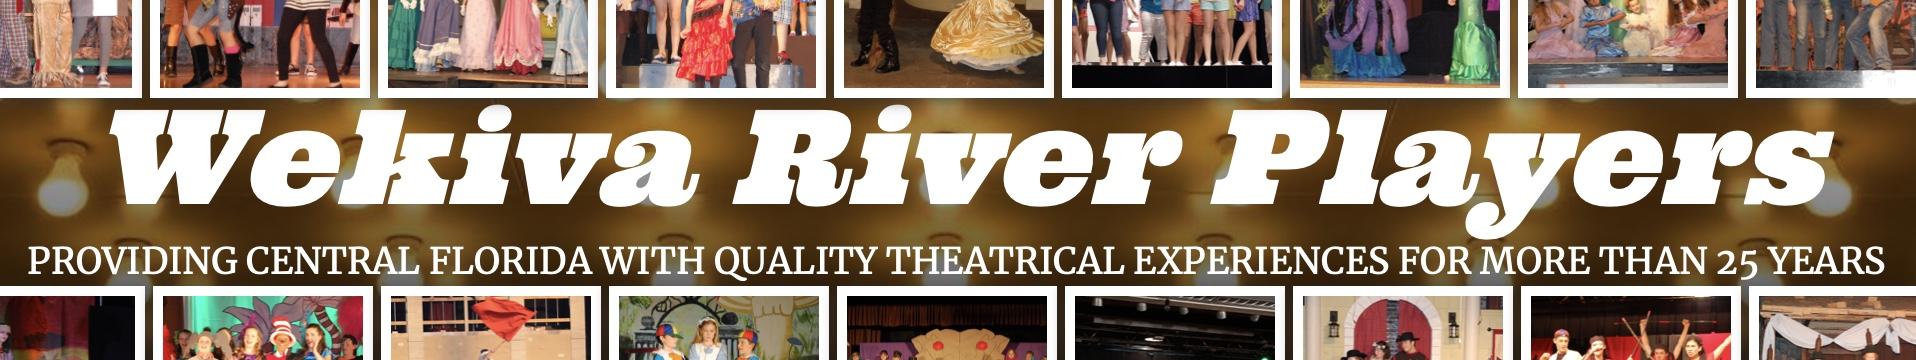 Wekiva River Players Summer Theatre Workshops